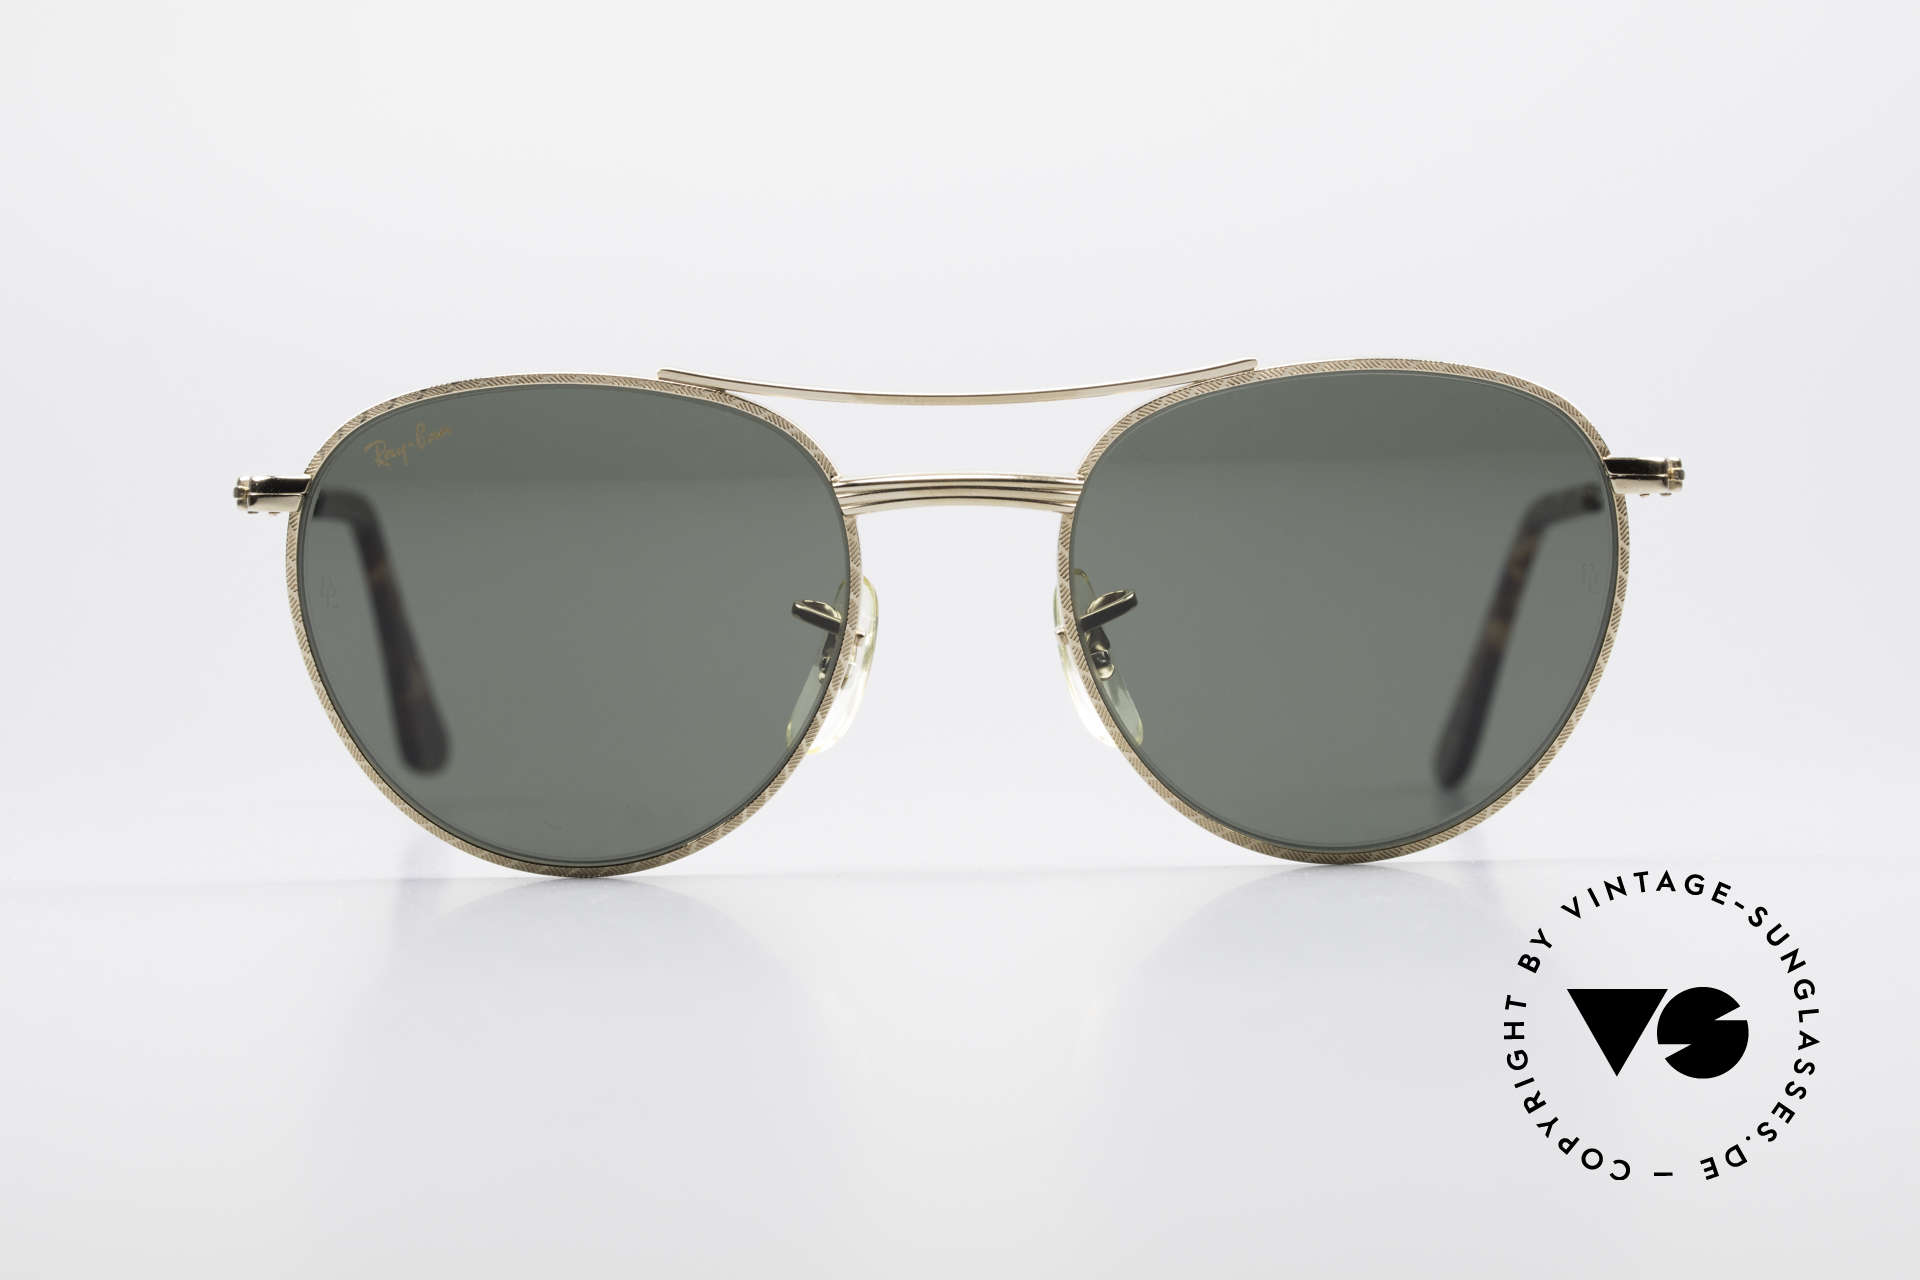 f95e441477e2 Sunglasses Ray Ban 1940 s Retro Round Old Ray-Ban USA Bausch Lomb ...